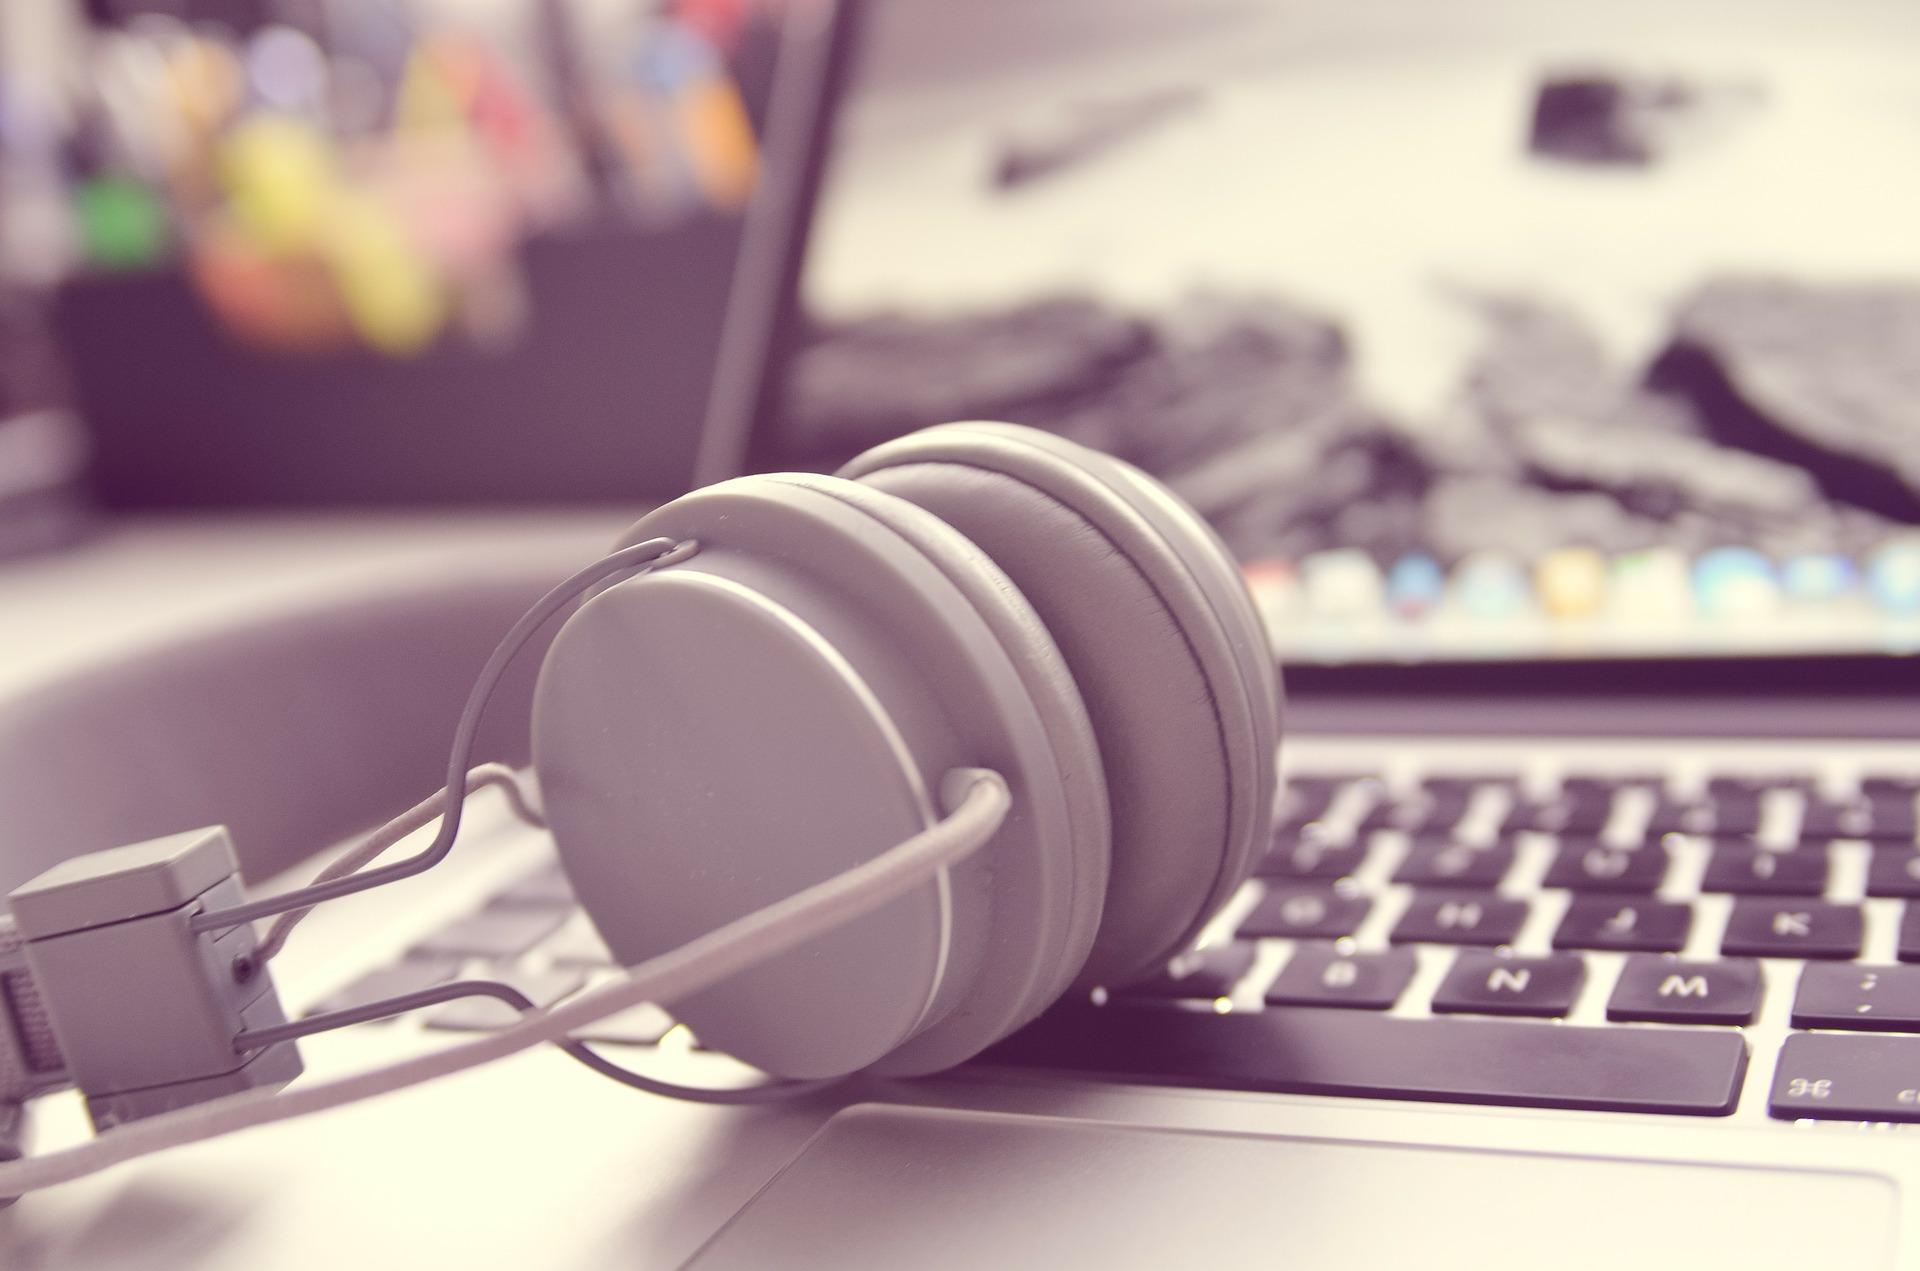 Онлайн-встречу провели в Доме культуры «Коммунарка»